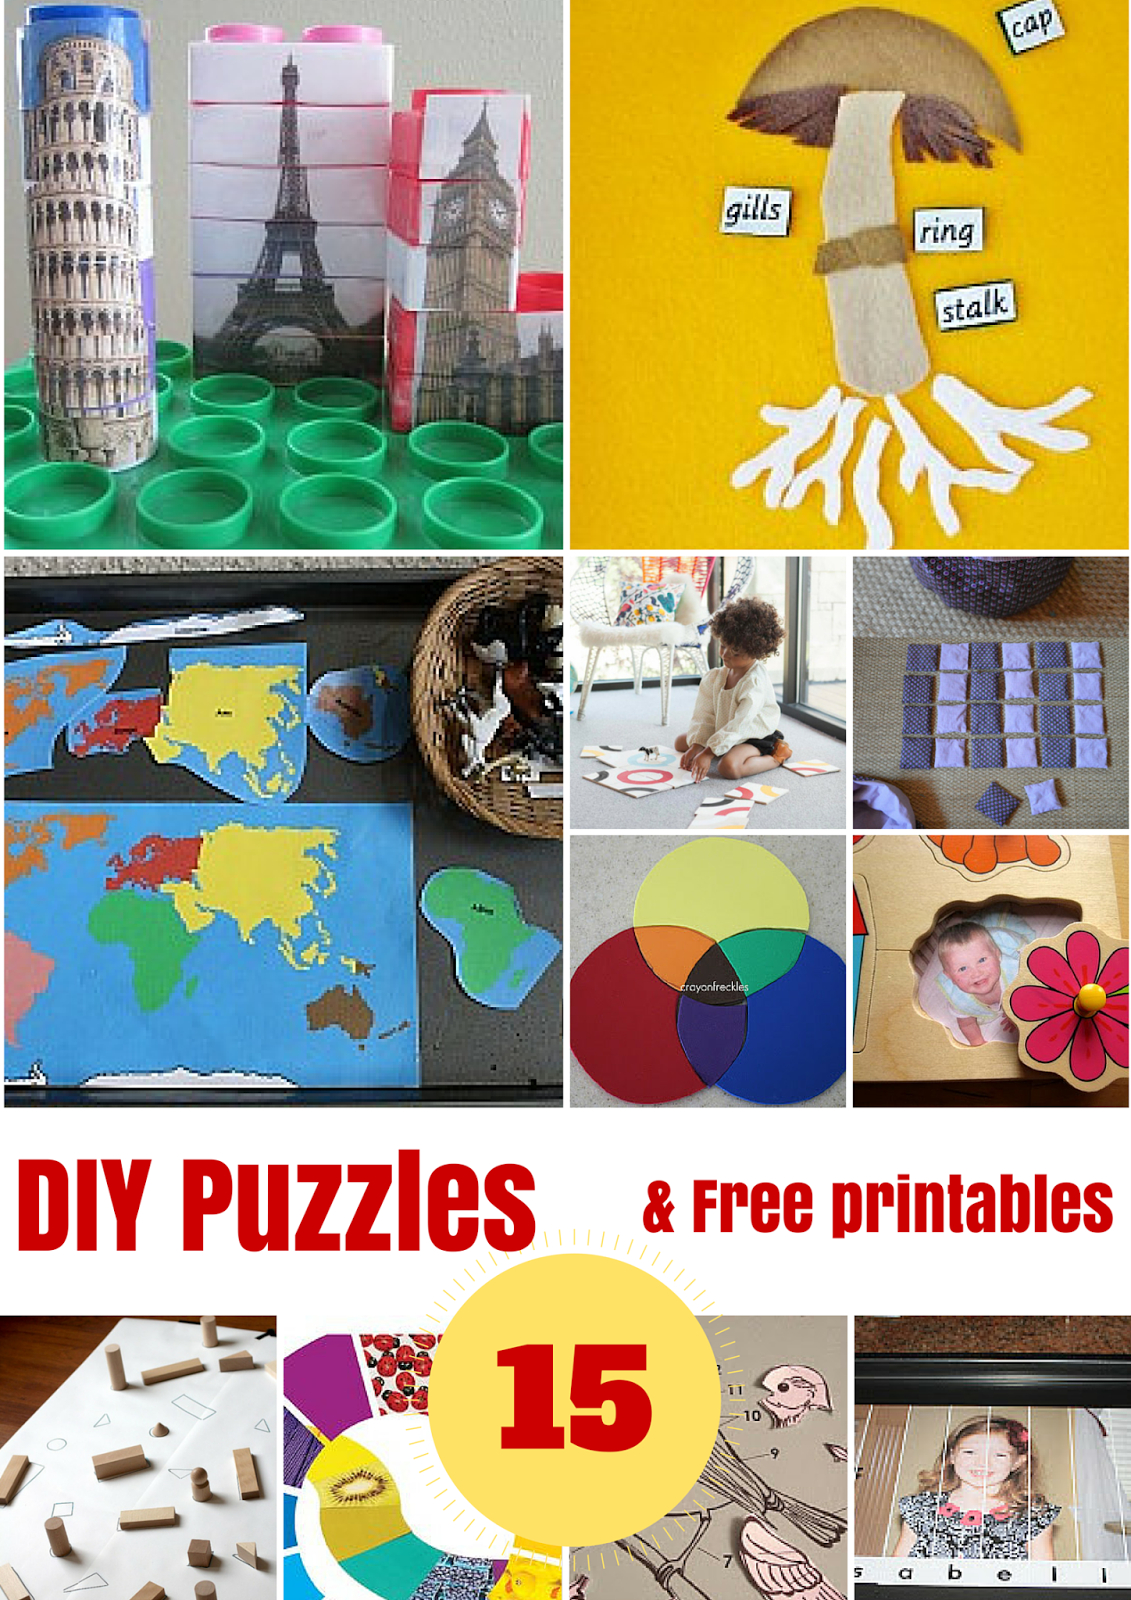 Diy Puzzles And Free Printables - Montessori Nature - Unique Printable Puzzles